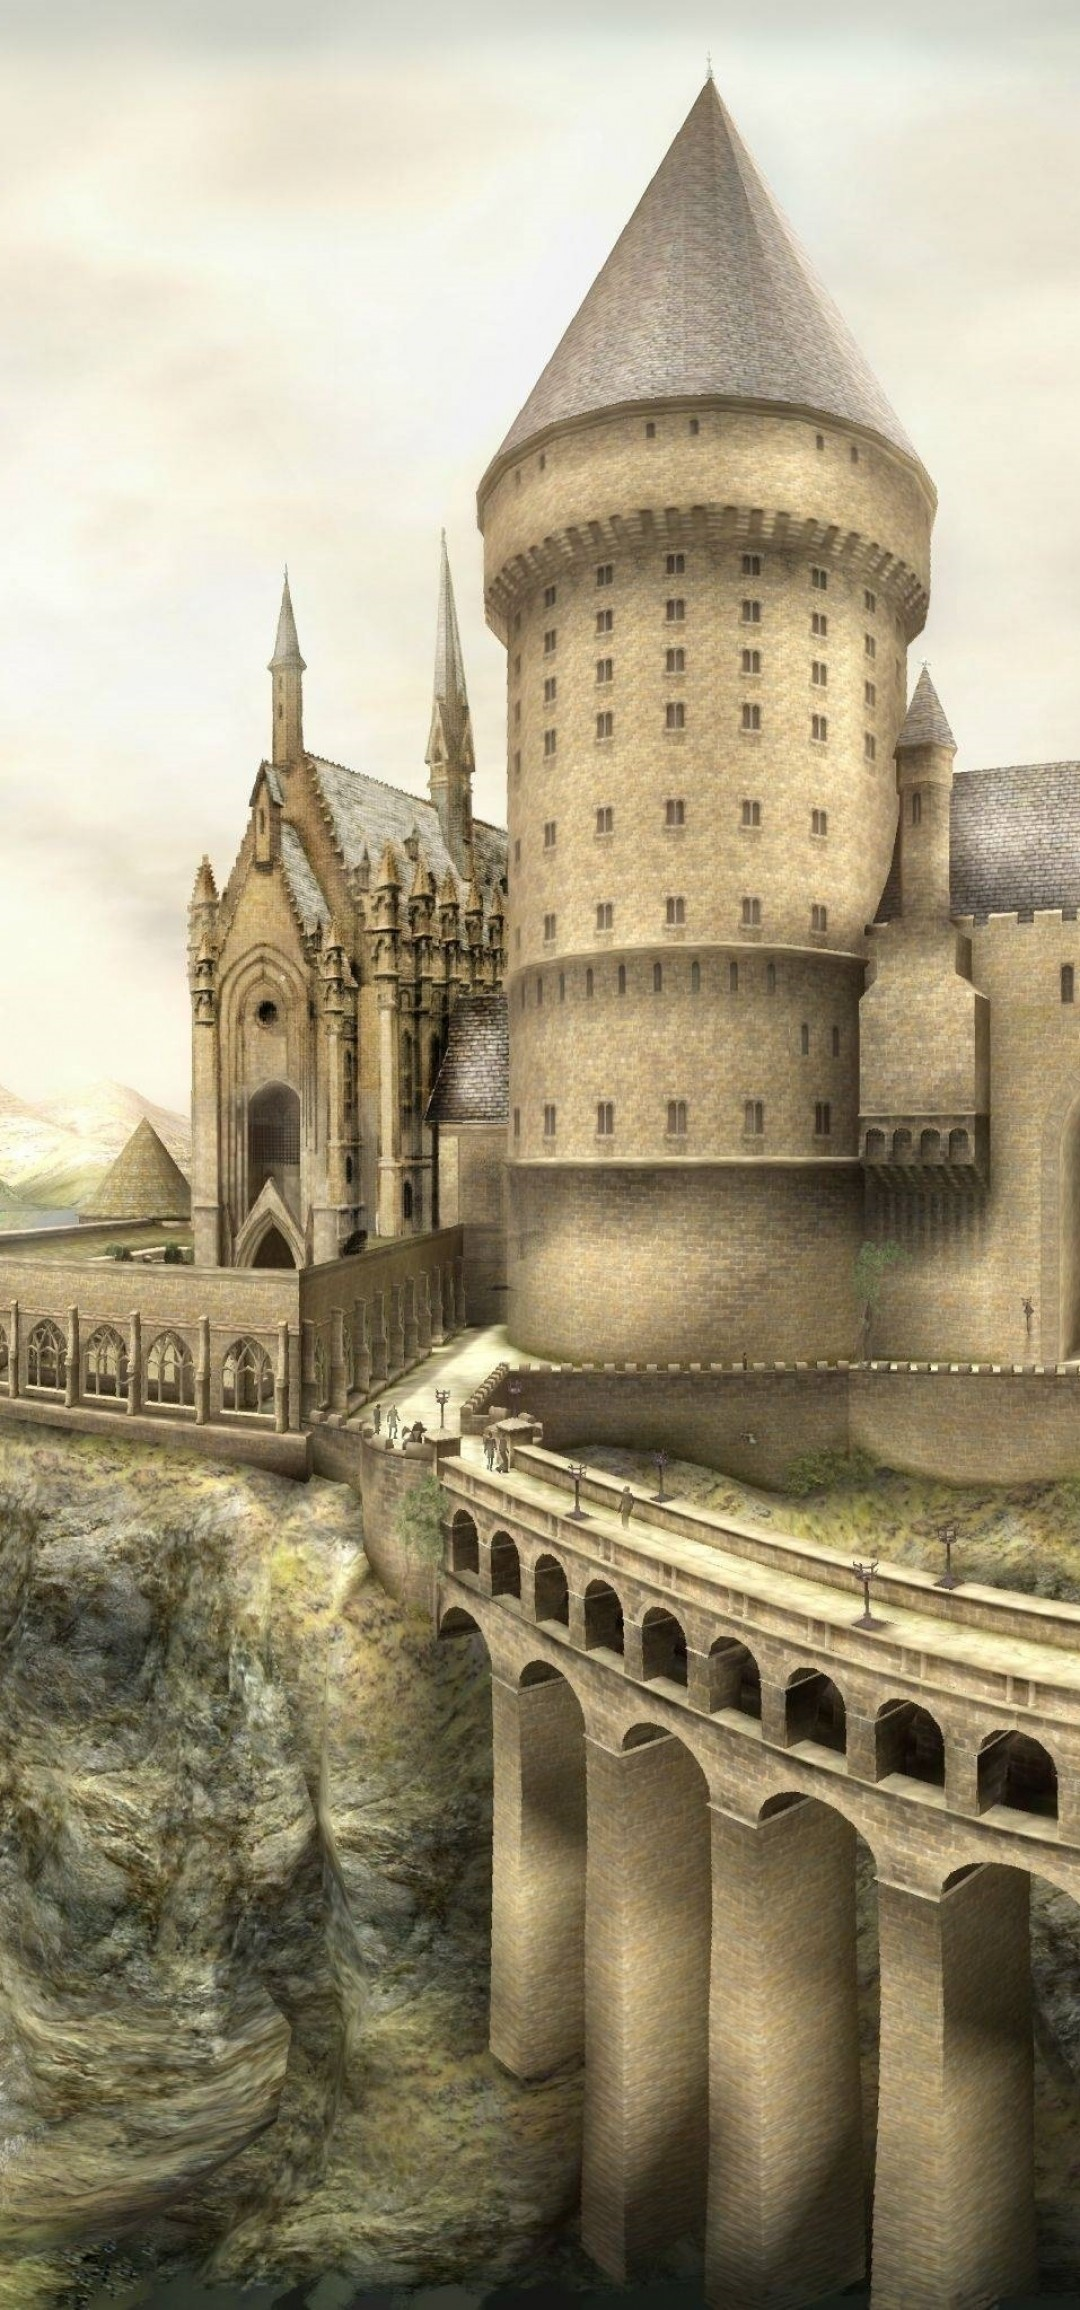 Harry Potter, Hogwarts, Magic School, 3d Model - Hogwarts Order Of The Phoenix , HD Wallpaper & Backgrounds